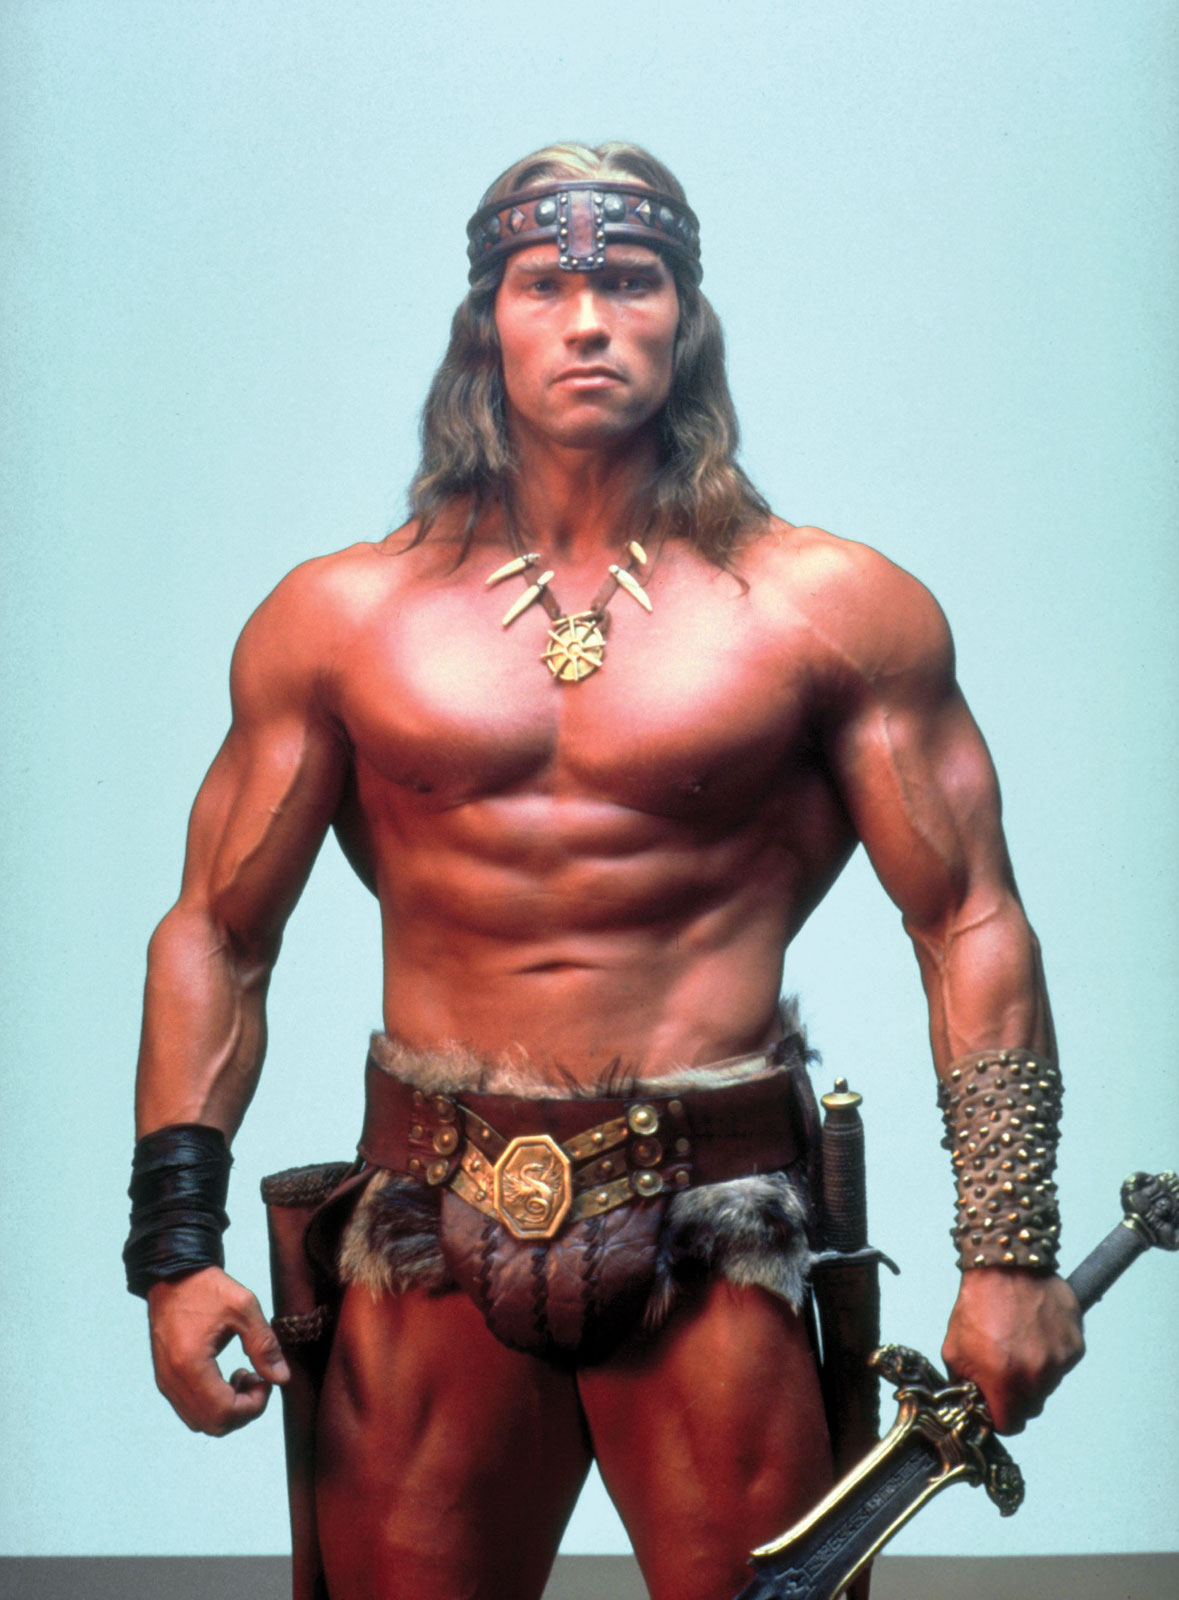 [Jeu] Association d'images - Page 17 Conan-the-barbarian